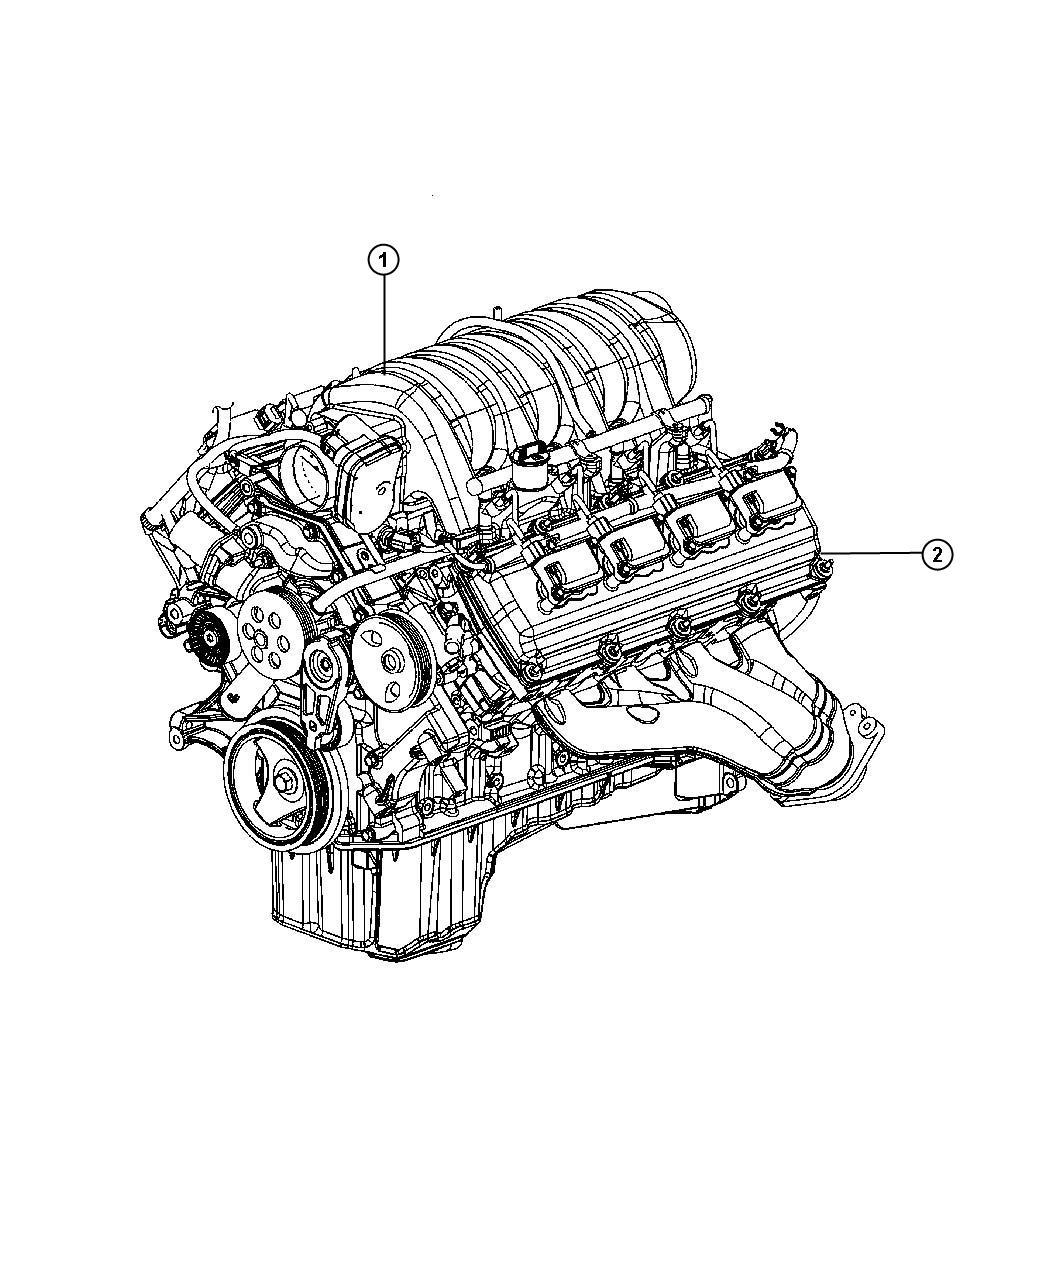 Dodge Challenger Engine. Long block. Remanufactured